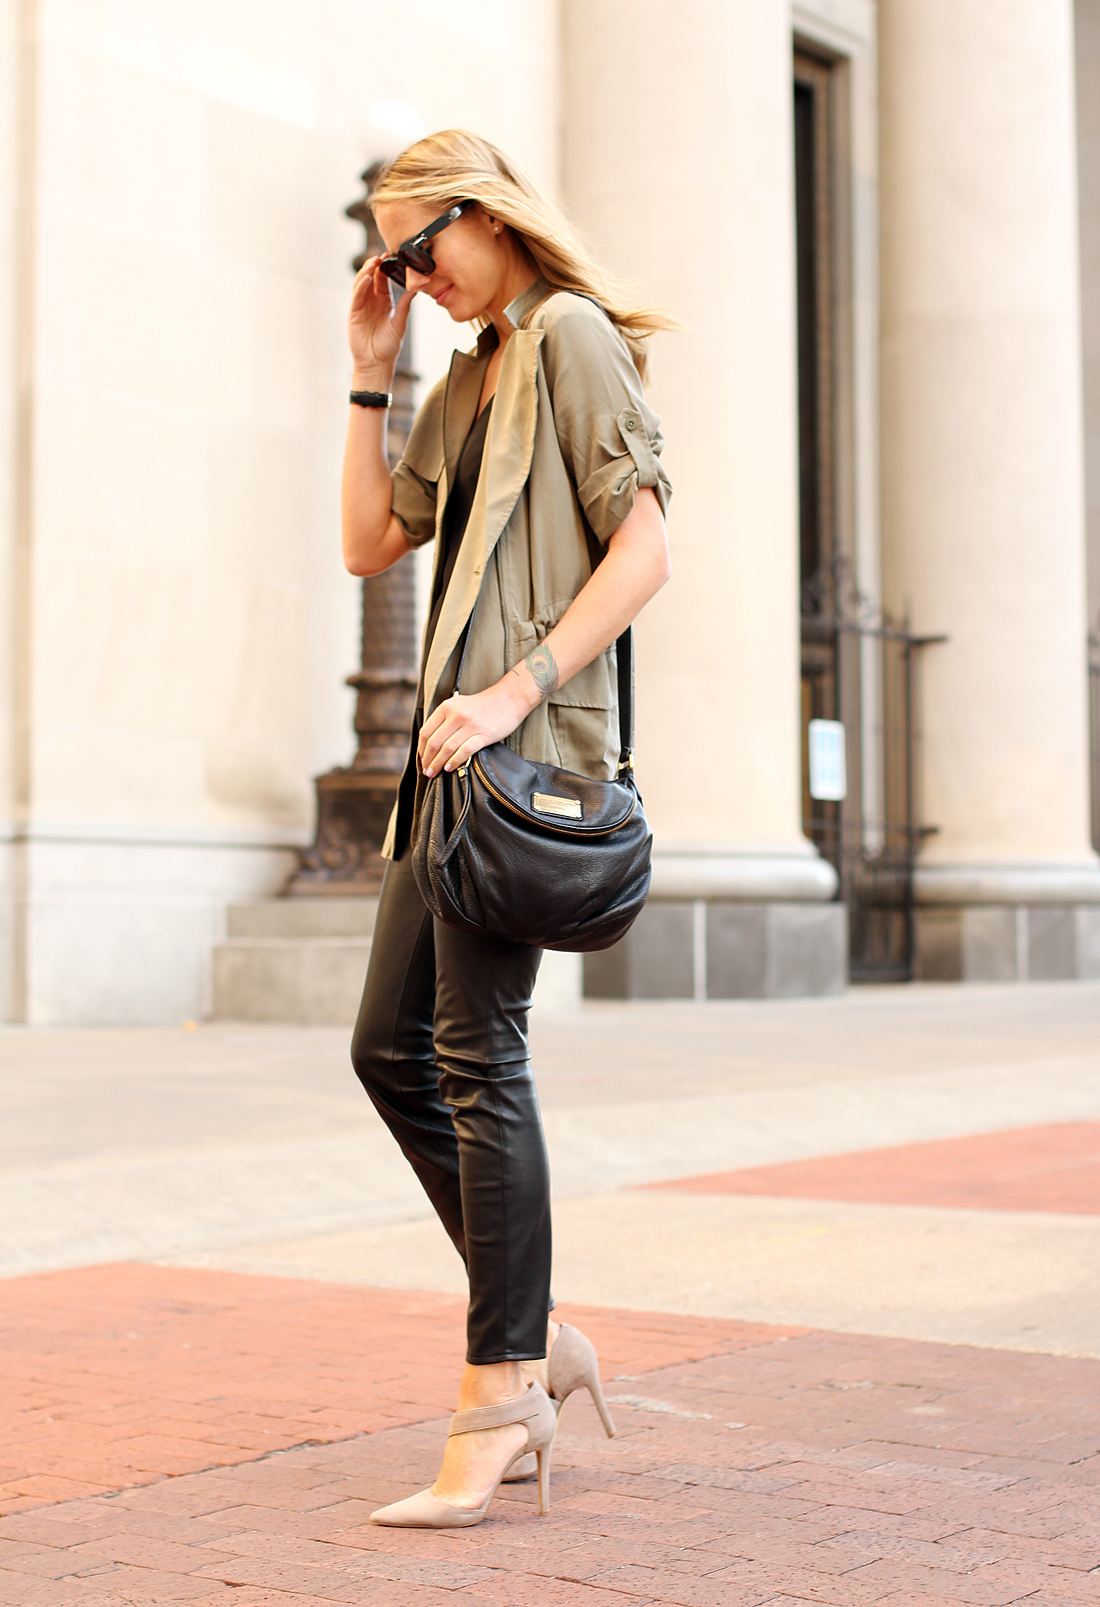 fashion-jackson-banana-republic-drapey-drawstring-jacket-black-faux-leather-pants-vince-camuto-carlotte-pumps-marc-by-marc-jacobs-natasha-q-handbag